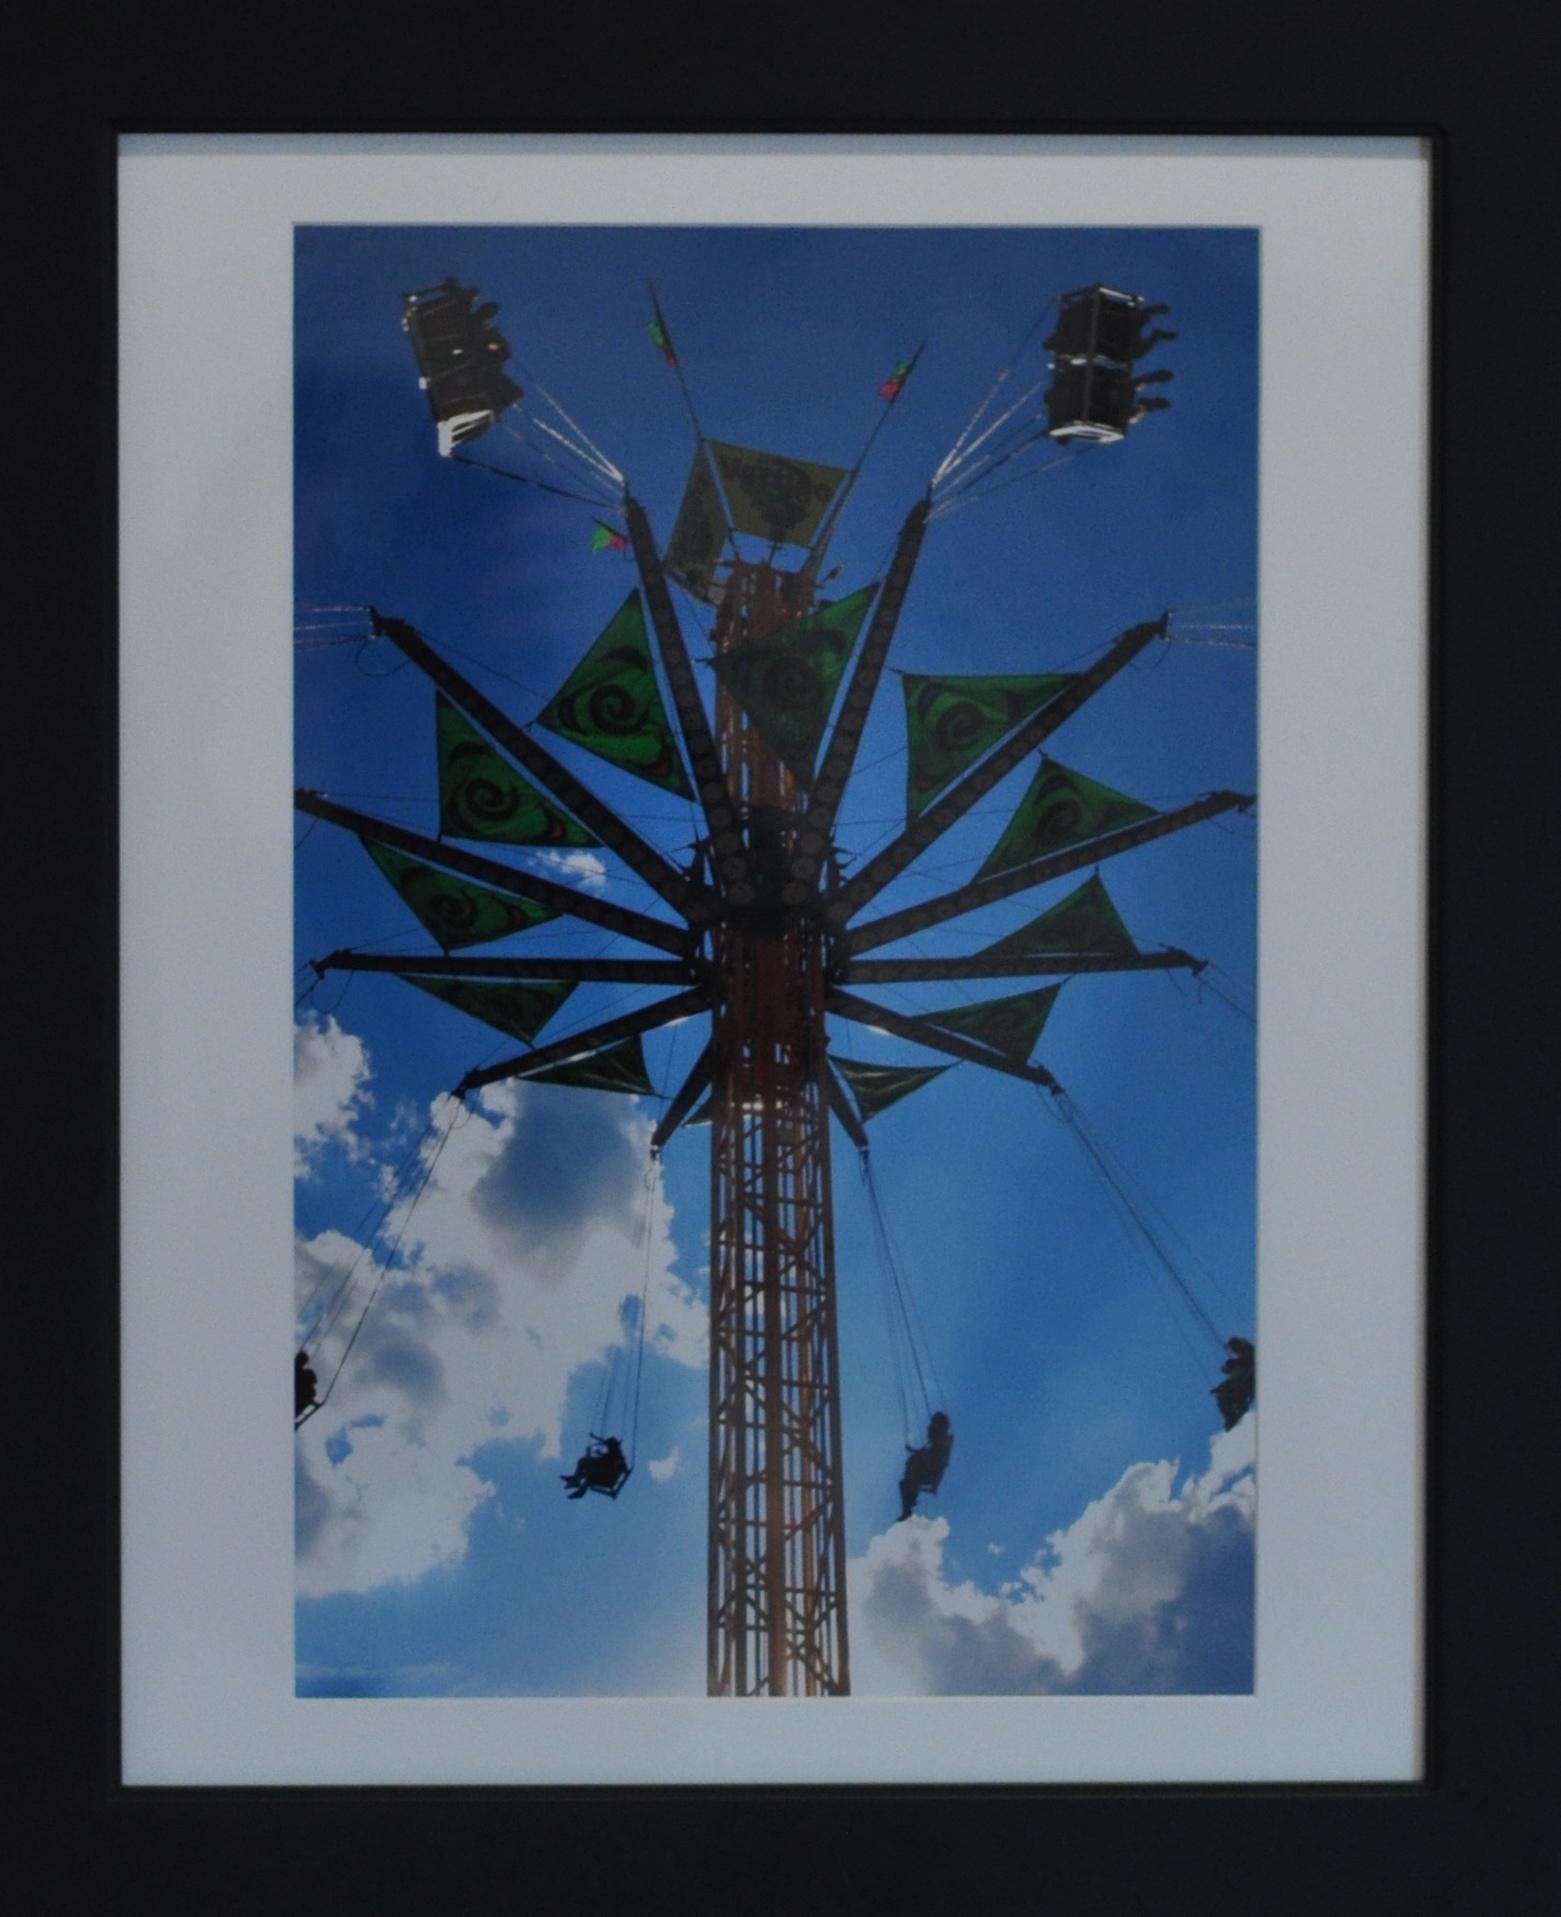 """Vertigo""   Photograph, 2012    Adam Geisen   Class of 2004"